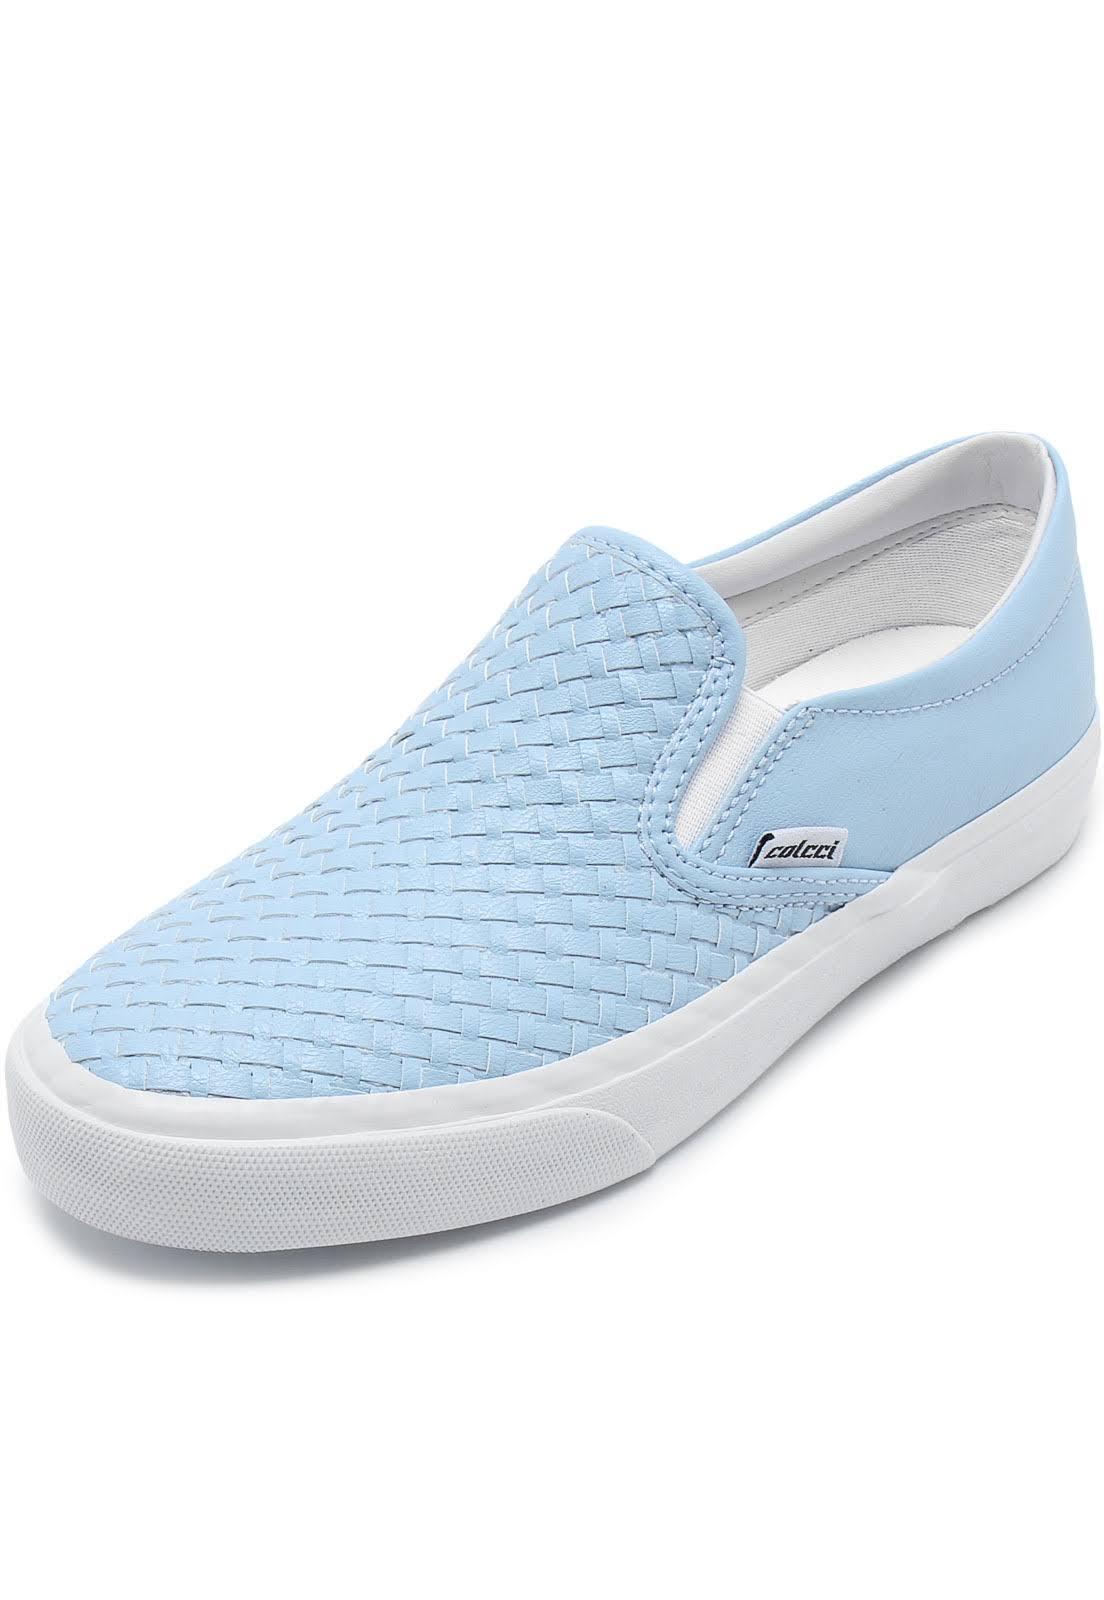 On Slip Paula Colcci Azul Colcci Slip Paula On Slip Azul On orBdCxWe